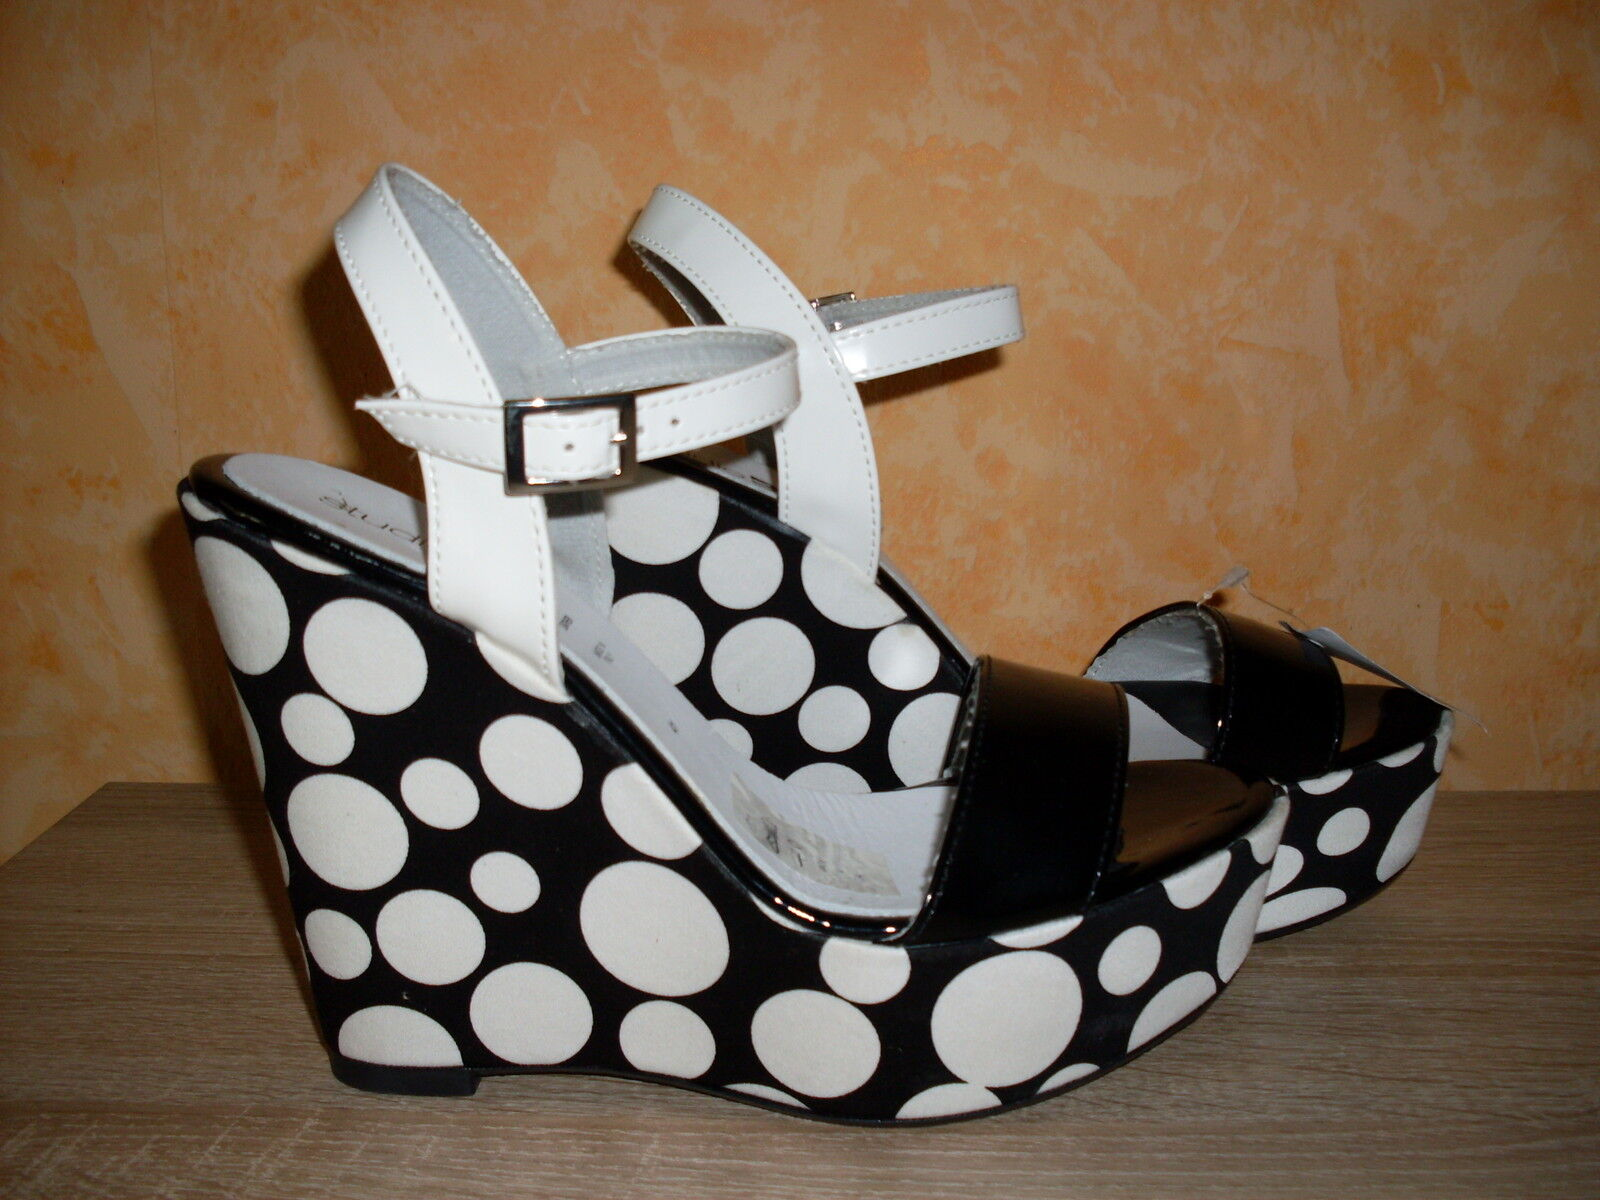 Damenschuh Studio W 14 cm Keil Sandalette NEU Gr. 41 schwarz / weiss Rockabilly